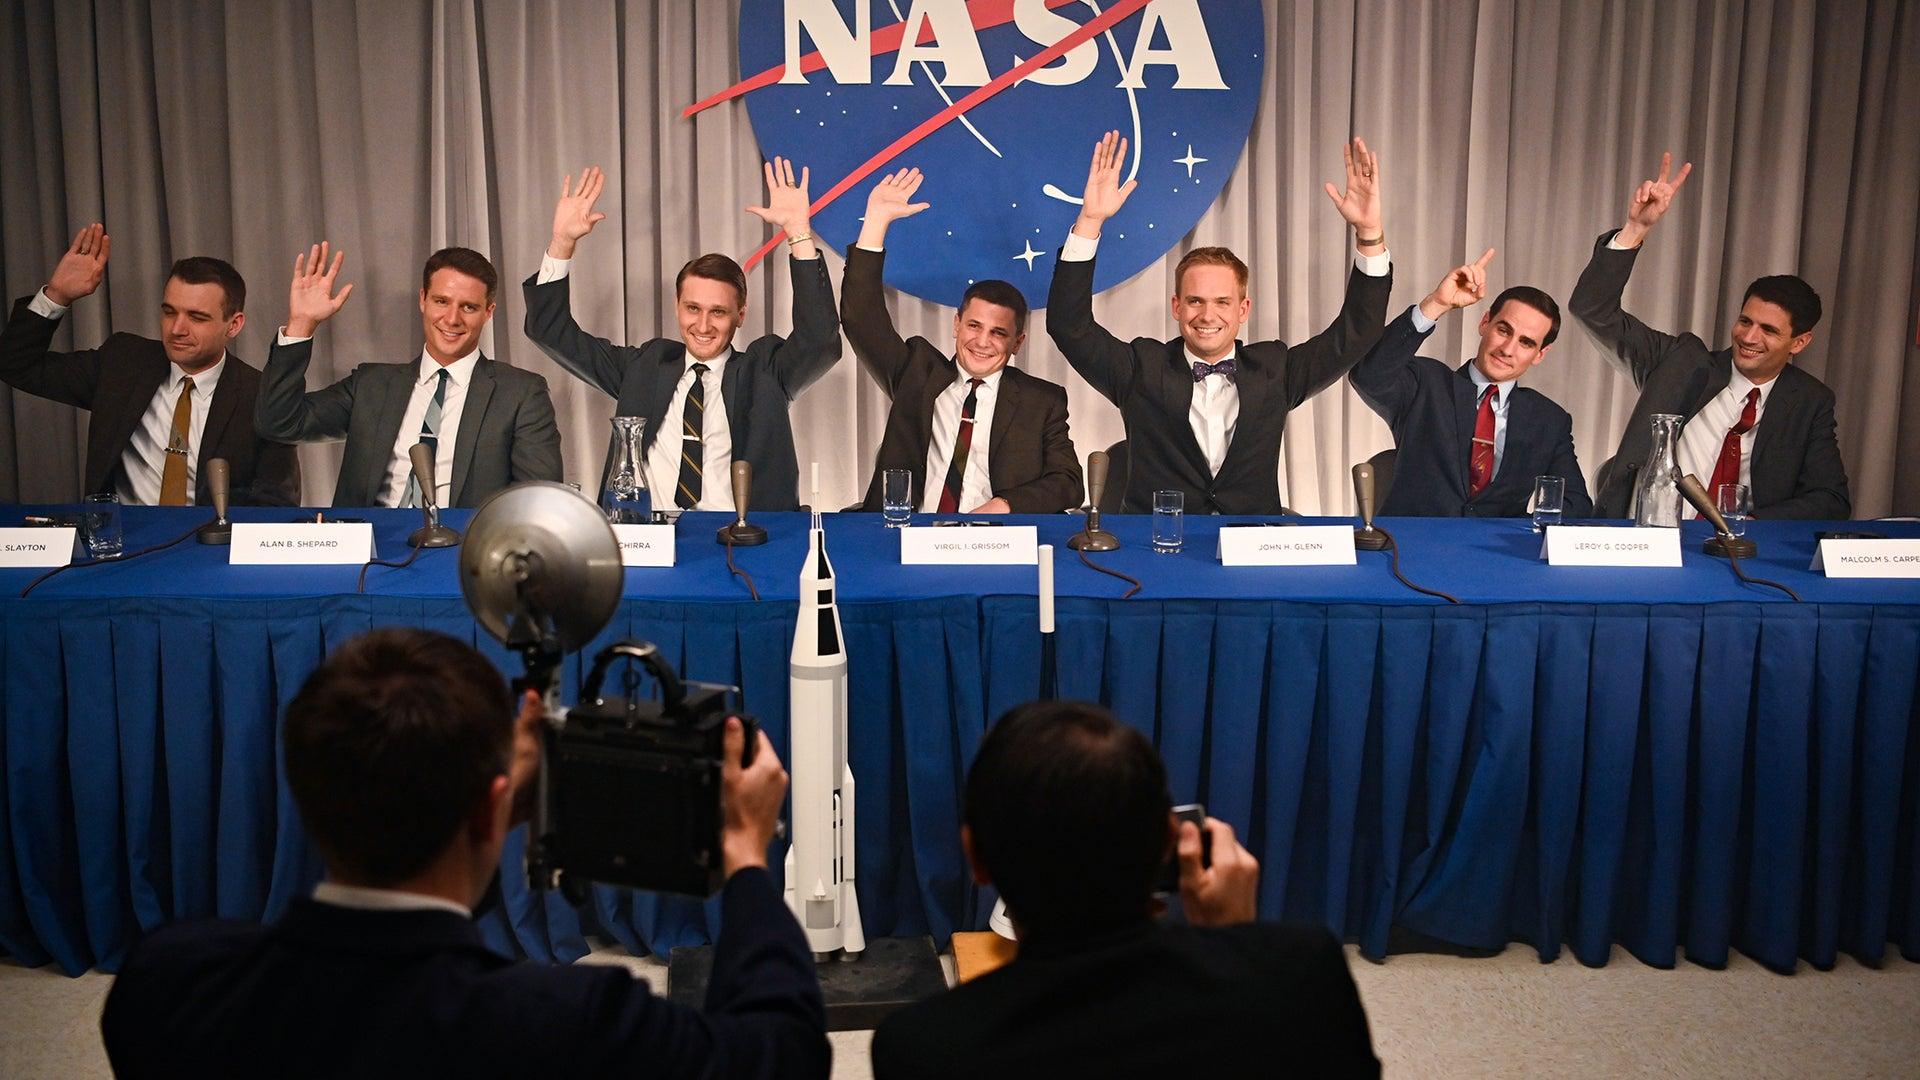 Micah Stock, Michael Trotter, Aaron Staton, Patrick J. Adams, Jake McDorman, Colin O'Donoghue, James Lafferty, The Right Stuff